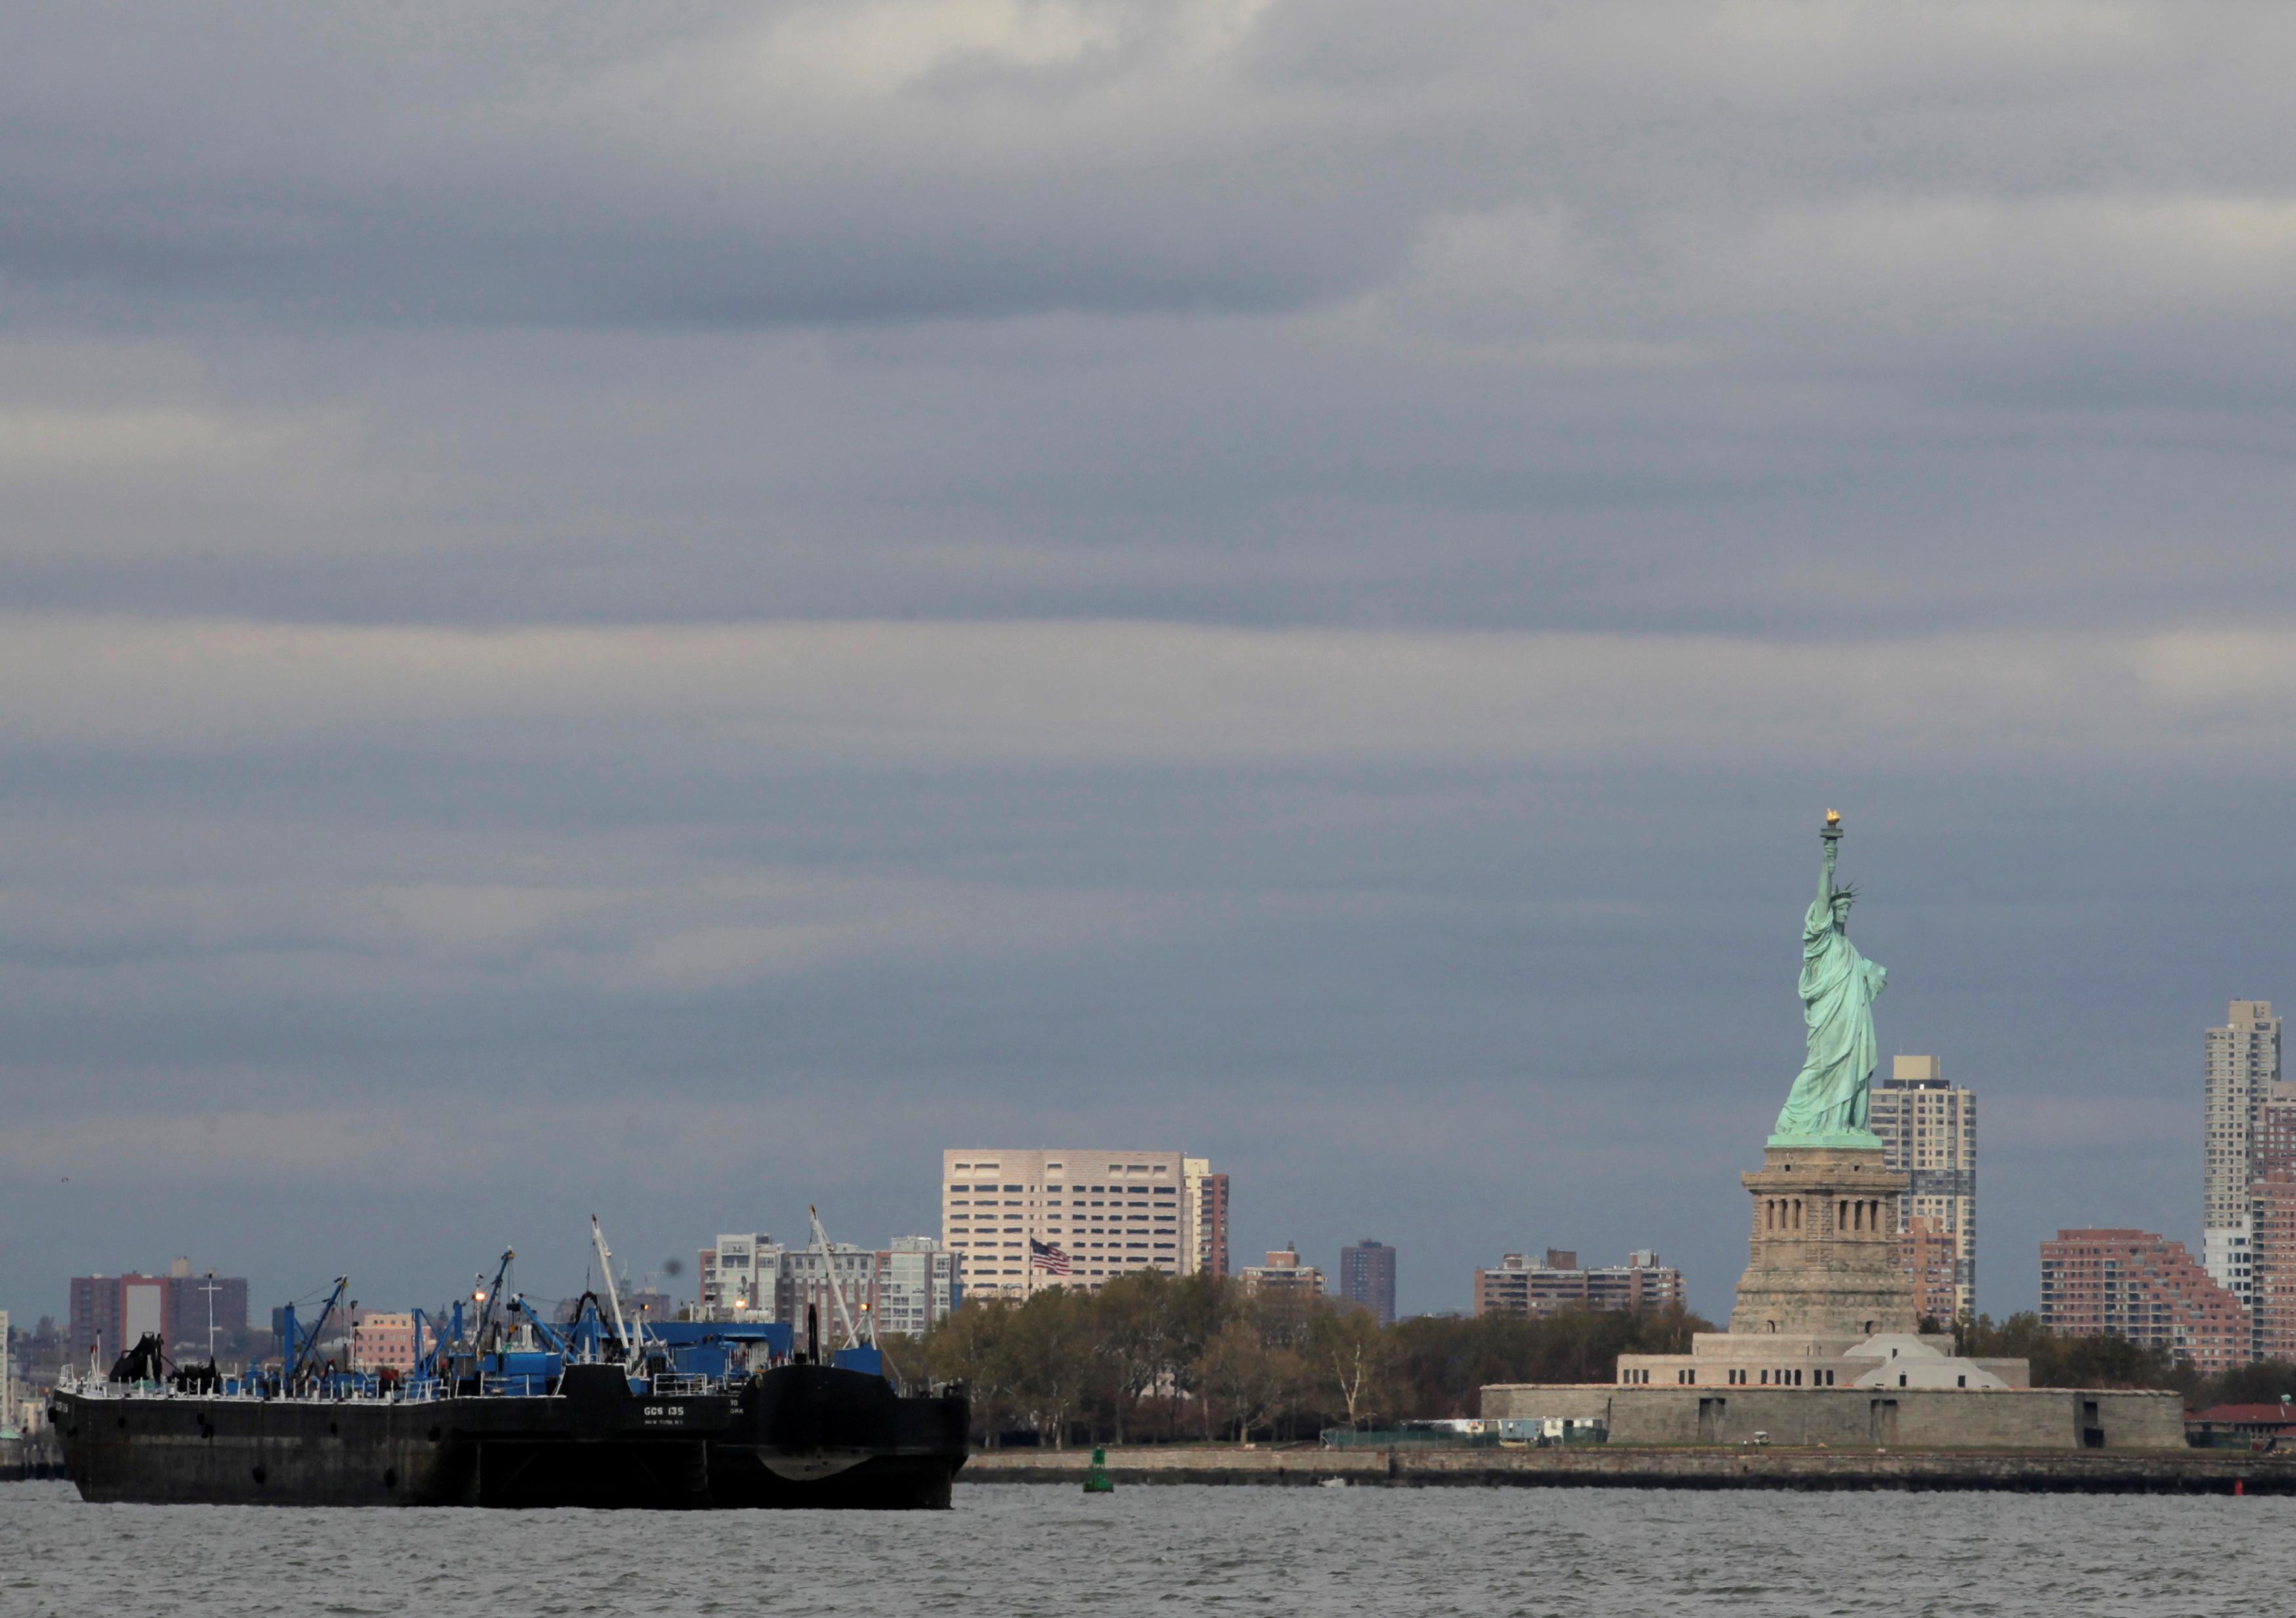 An oil tanker is anchored in New York Harbor October 31, 2012.  REUTERS/Brendan McDermid